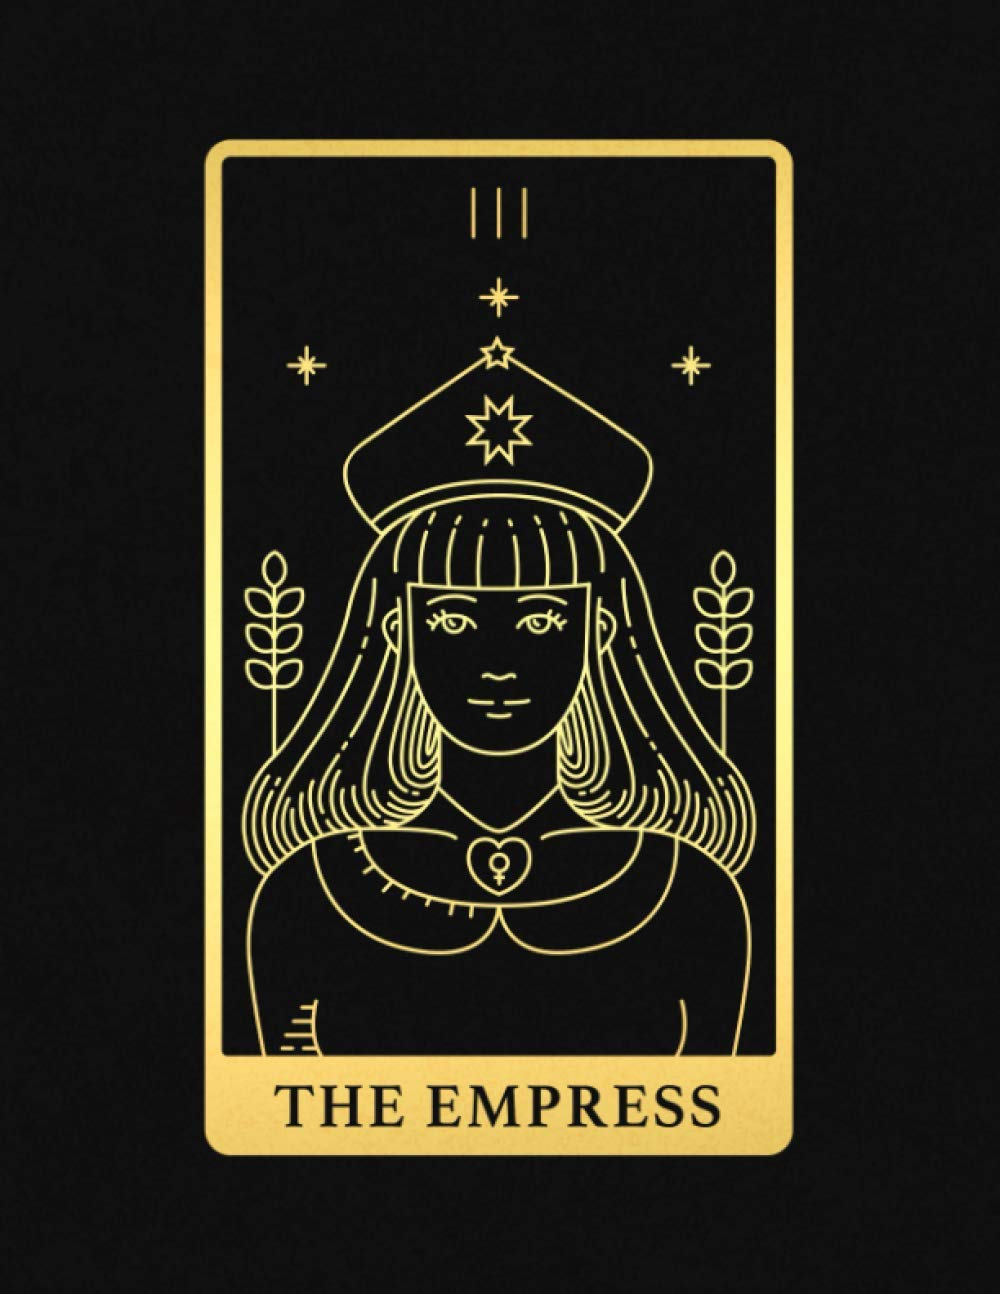 Empress Tarot Card-Empress NeedleMinder-Reversible Needleminder-Witchy Needle minder-Tarot Needleminder-Cross Stitch-Needlepoint-Embroidery